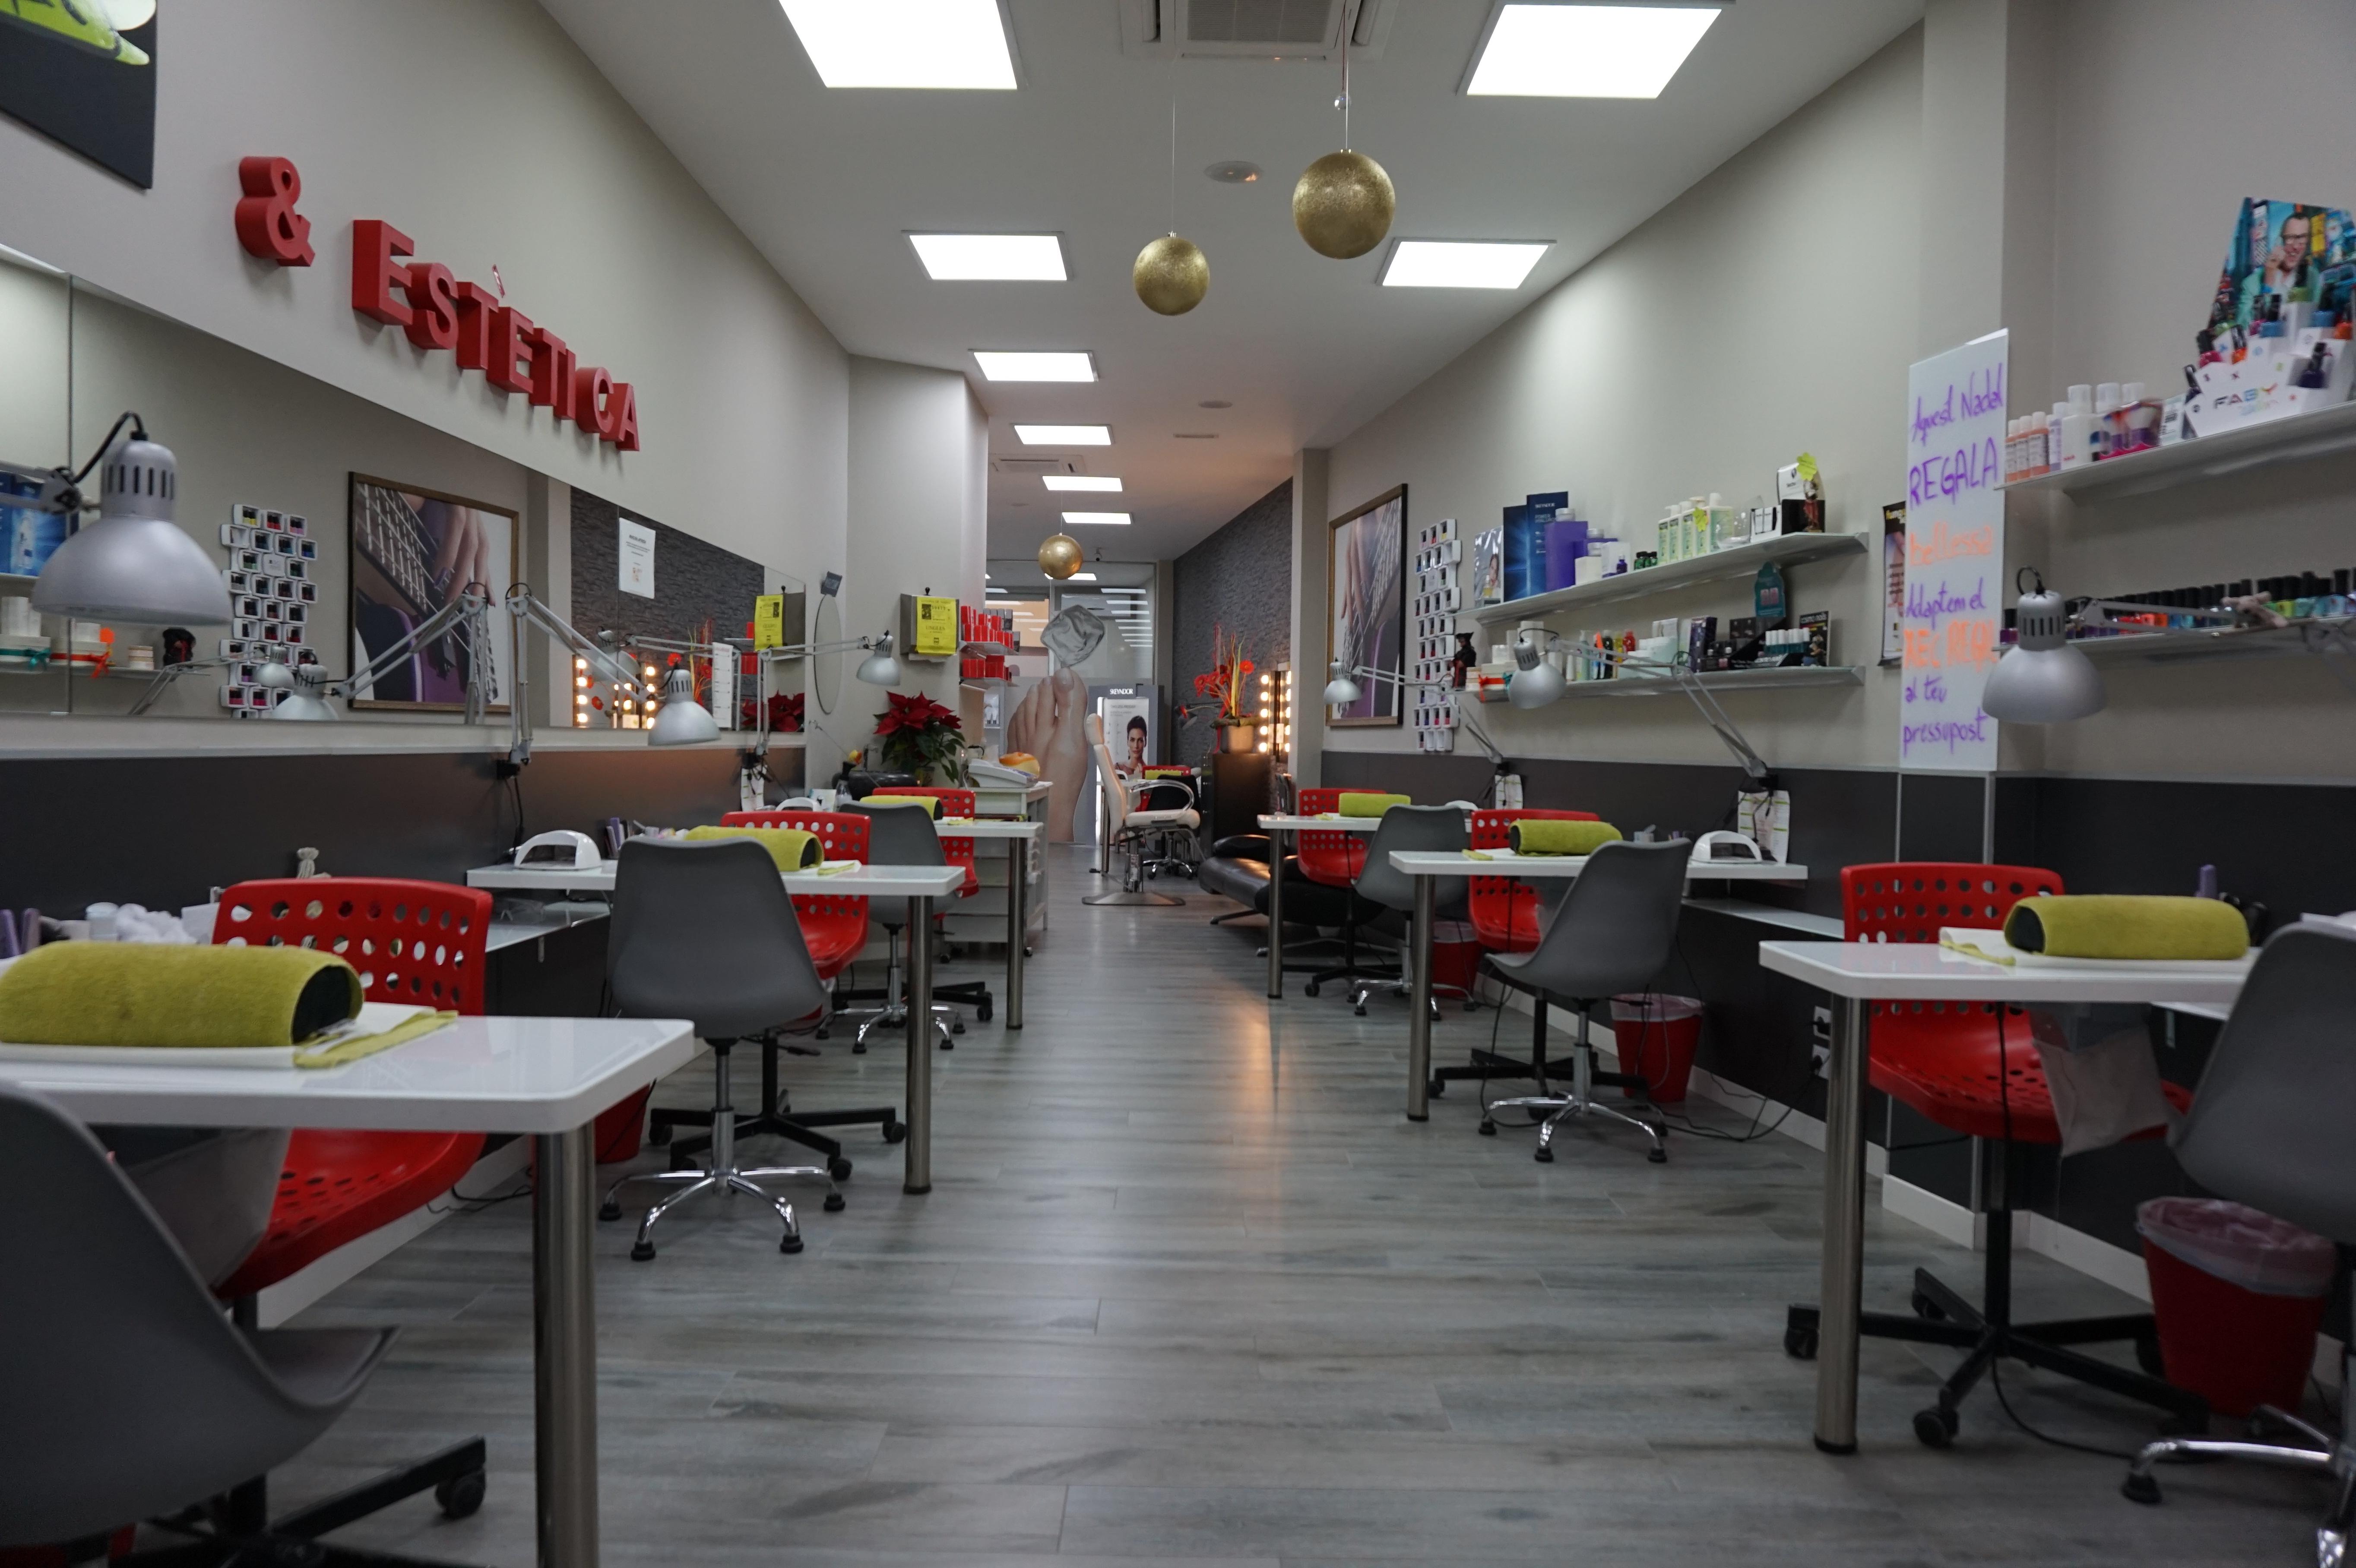 Centro para arreglar tus uñas - Ungles Mataró